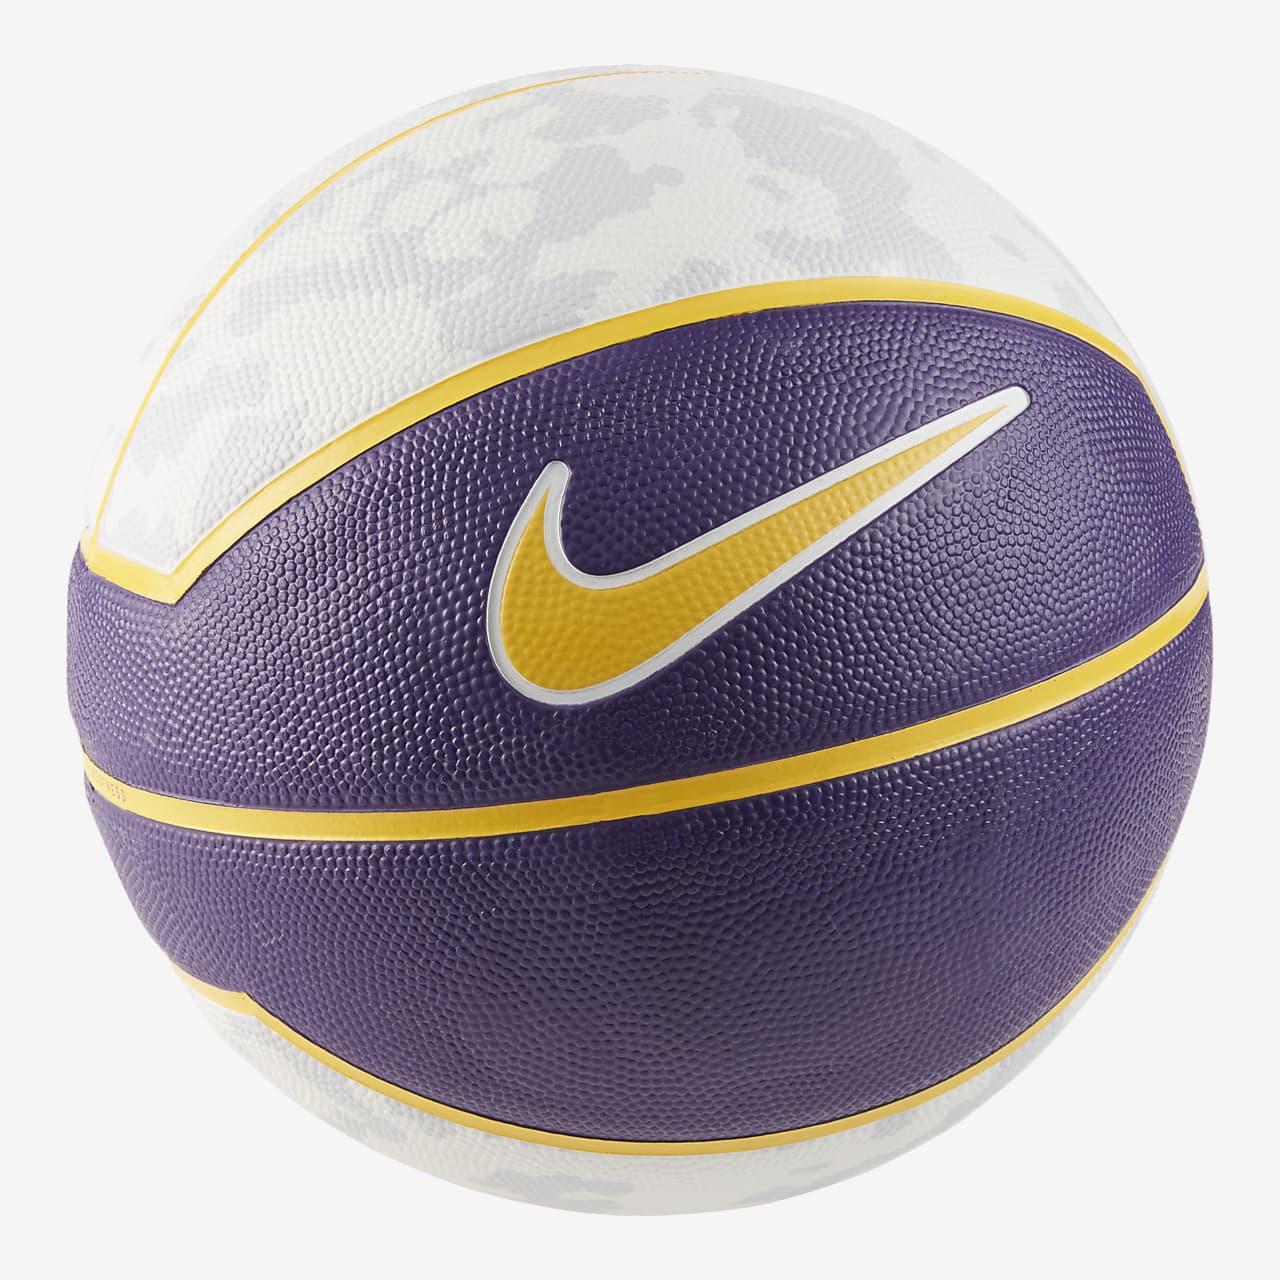 LeBron Playground 4P Basketball